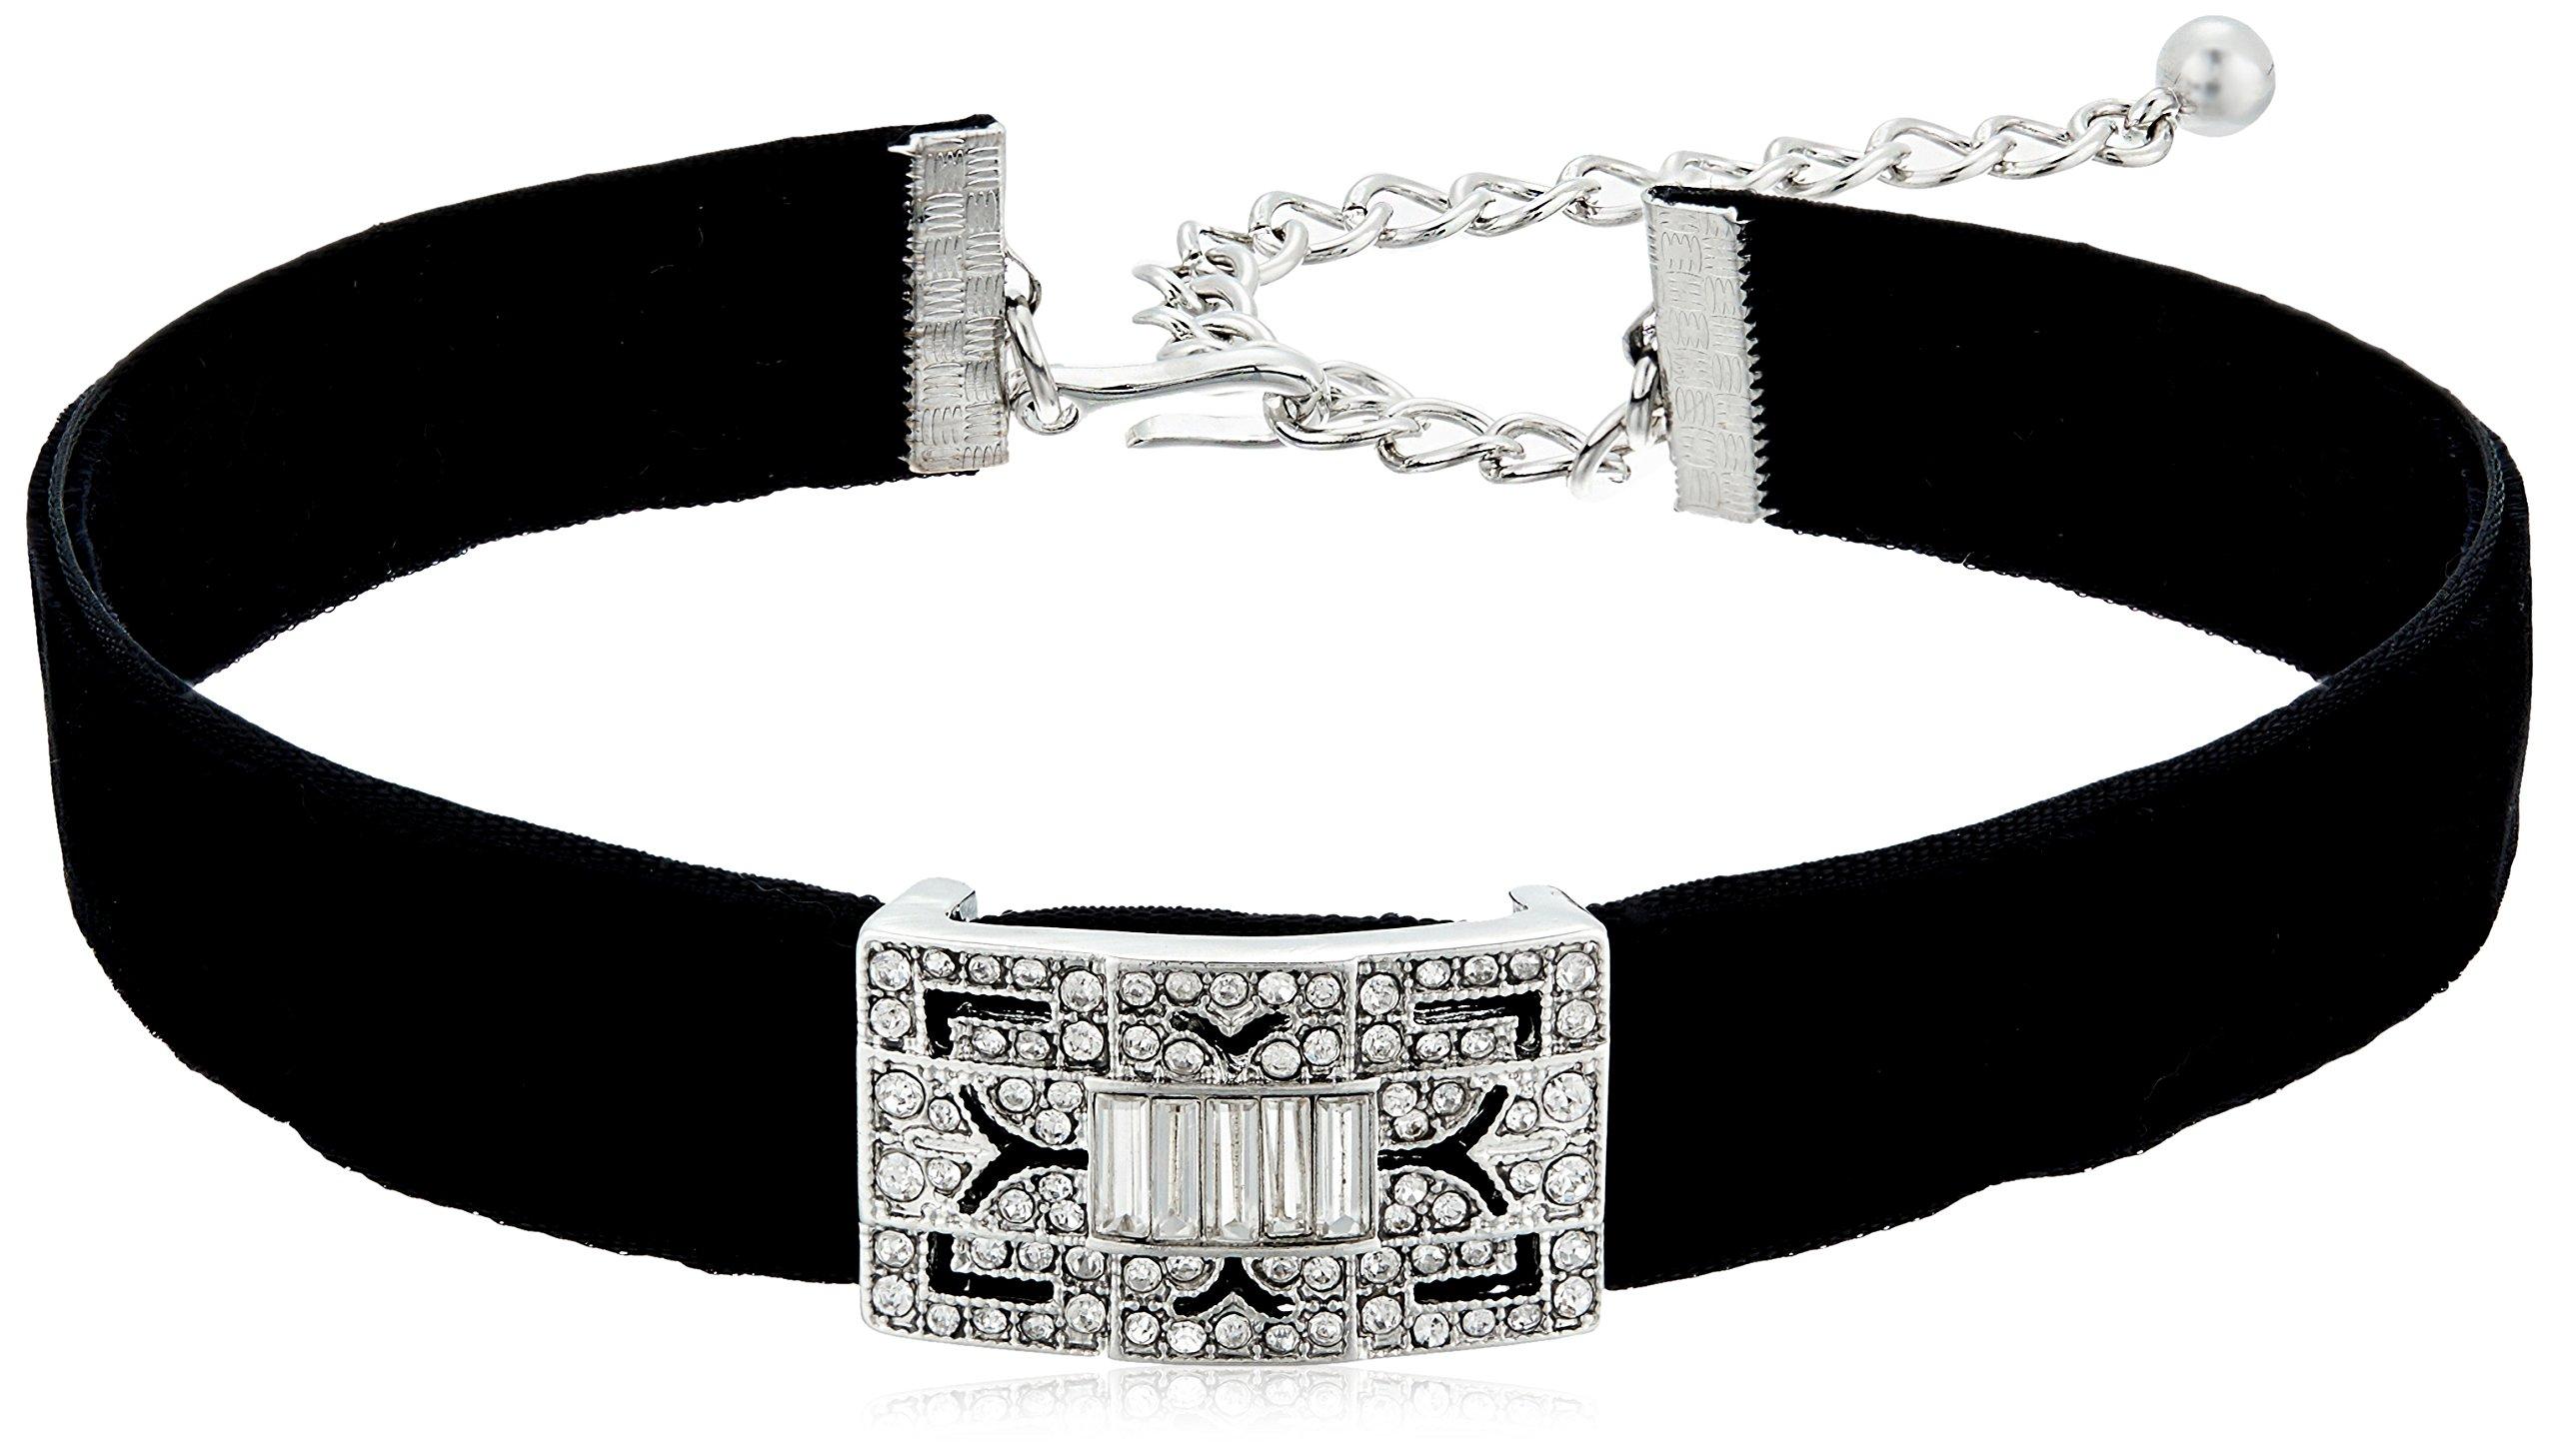 Kenneth Jay Lane Black Velvet with Silver/Crystal Deco Choker Necklace, 12'' + 4'' Extender